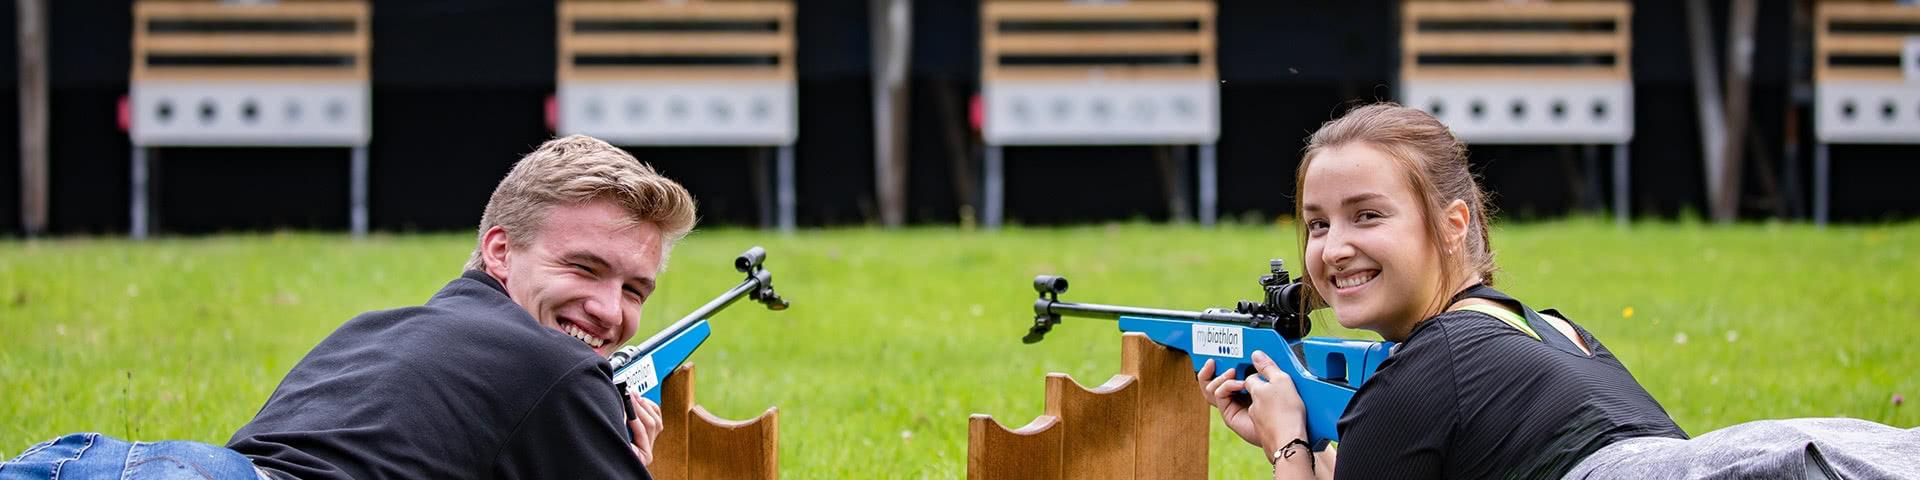 Gute Laune beim Biathlon schießen in Winterberg